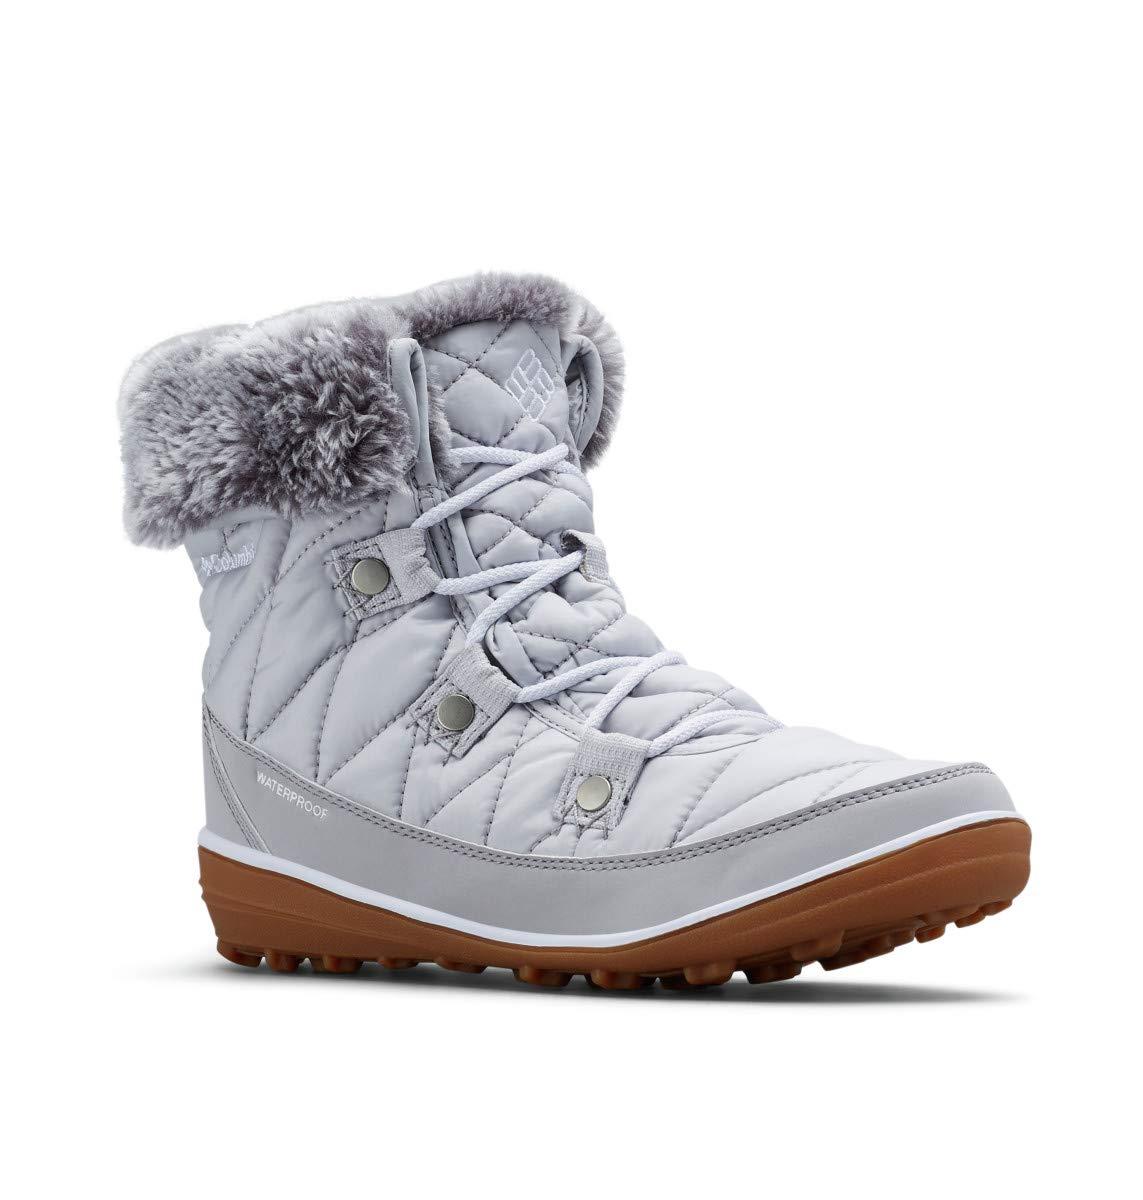 Columbia Women's Heavenly Shorty Omni-Heat Snow Boot, Grey ice, White, 9 Regular US by Columbia